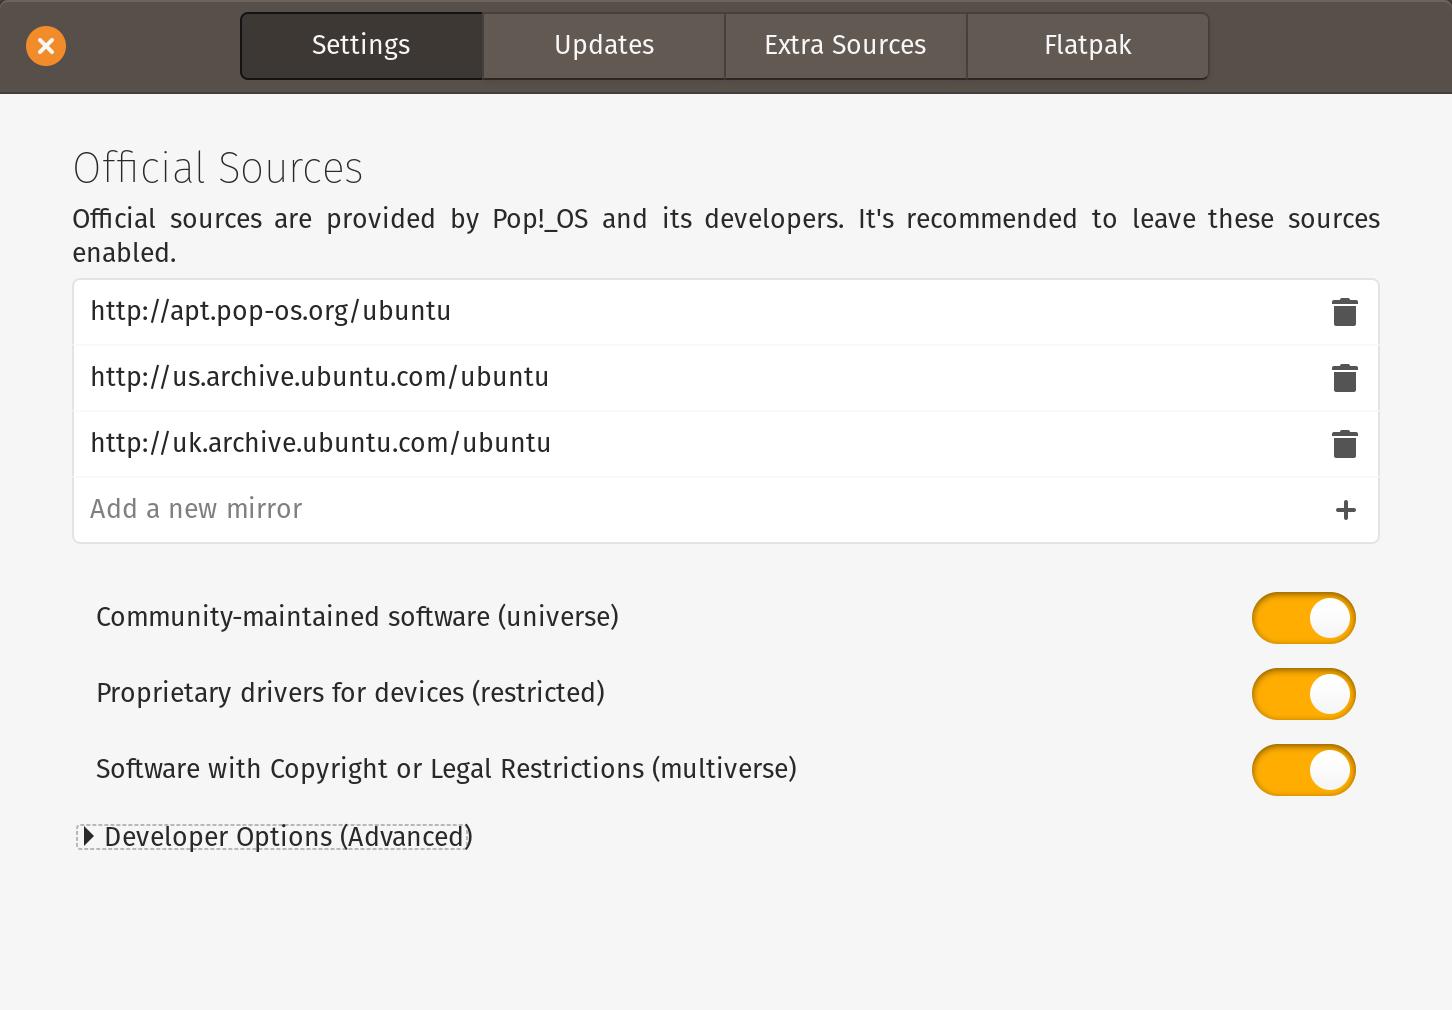 DeepinScreenshot_icon-library_20201013145847